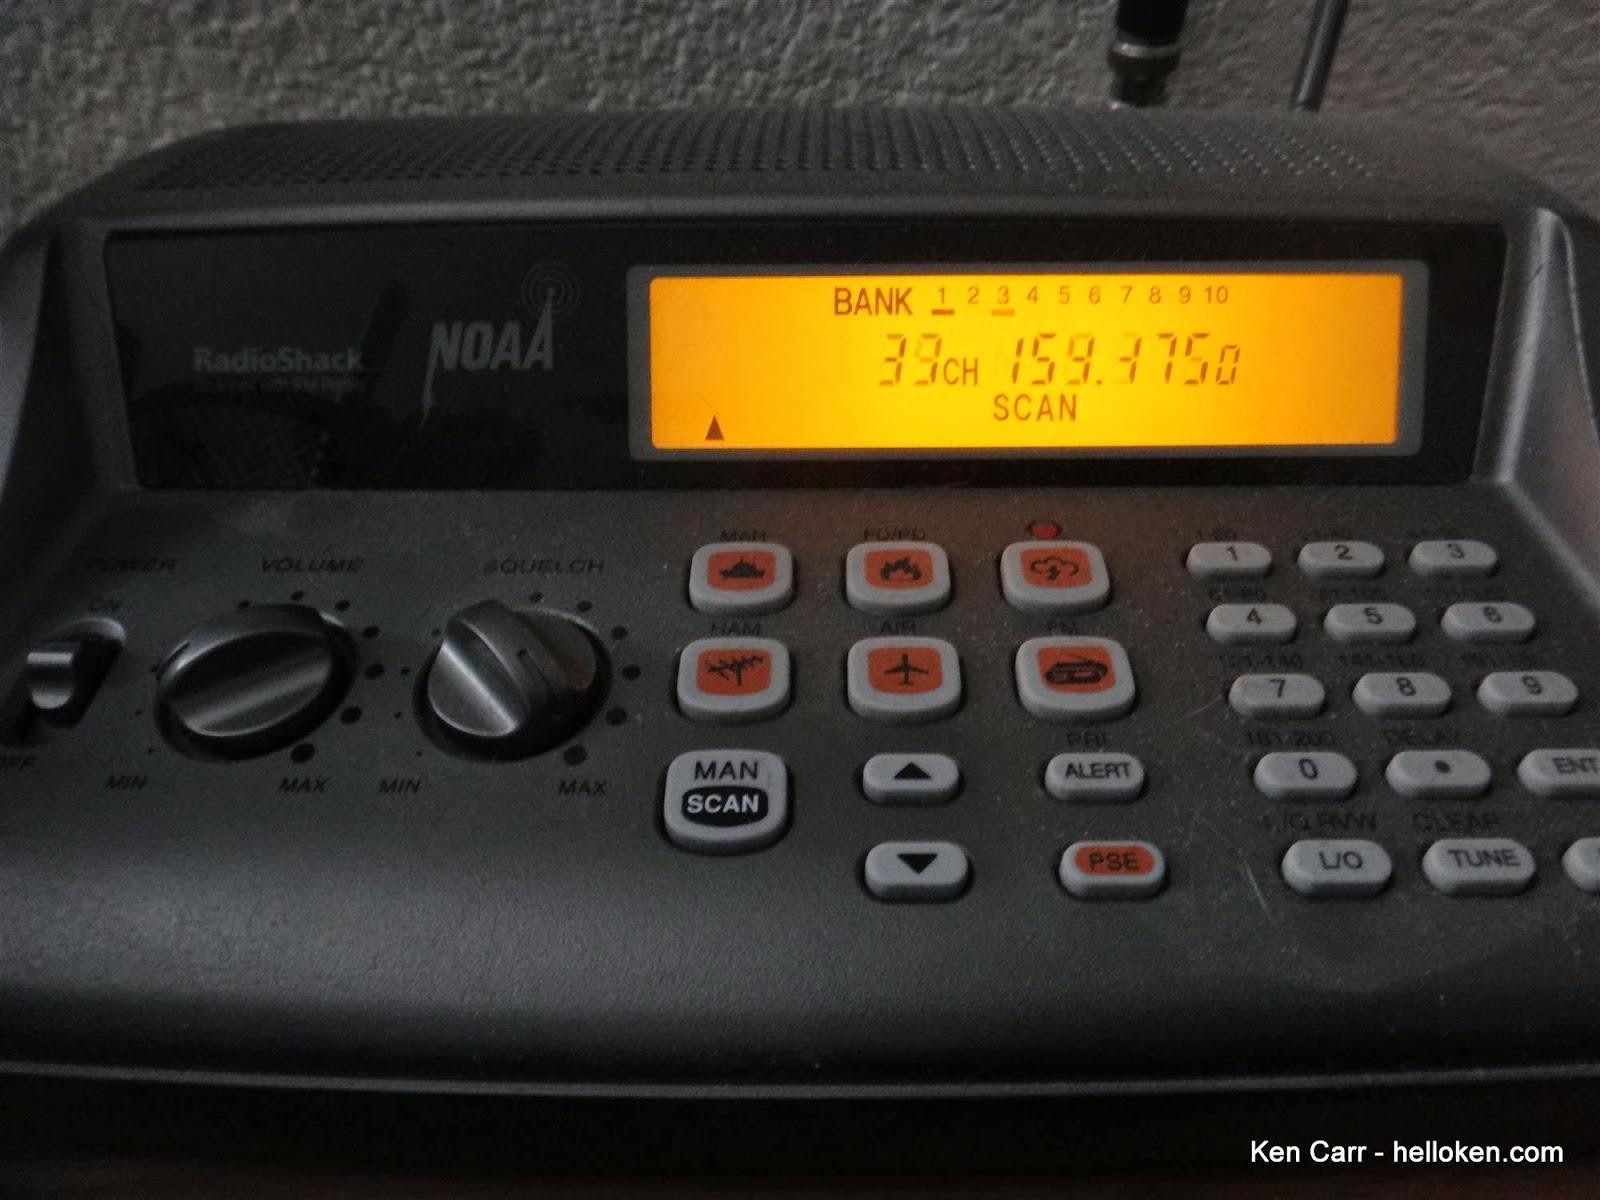 The Ken Carr Blog: @whatsuptucson needs a new scanner